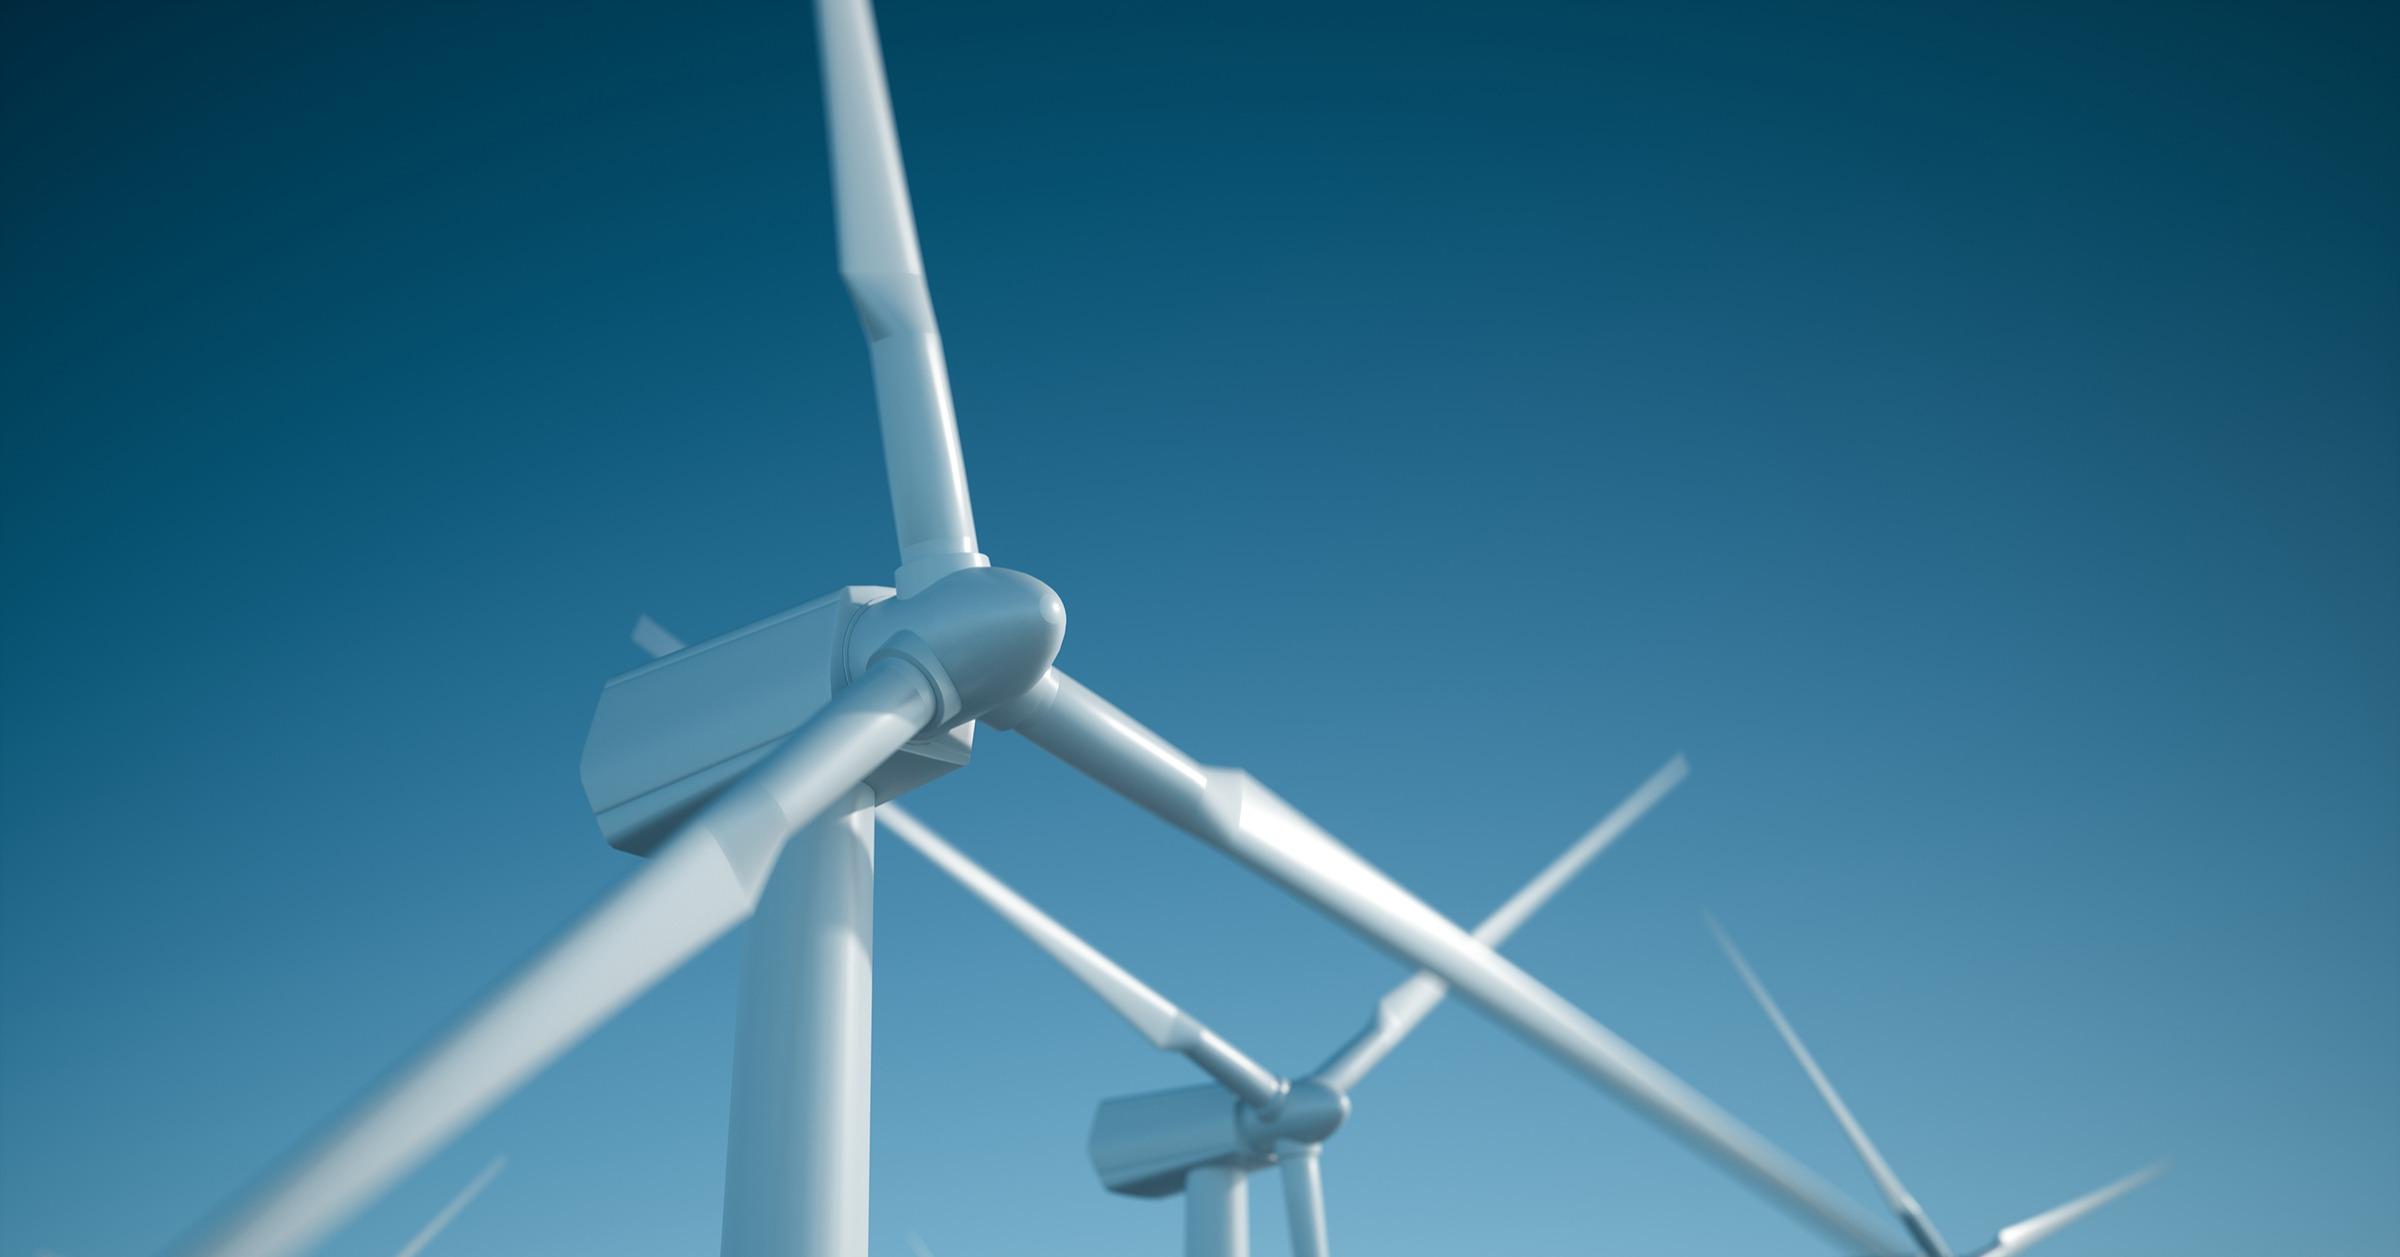 High Density Polyethylene Pipe Supports Renewables Energy Growth